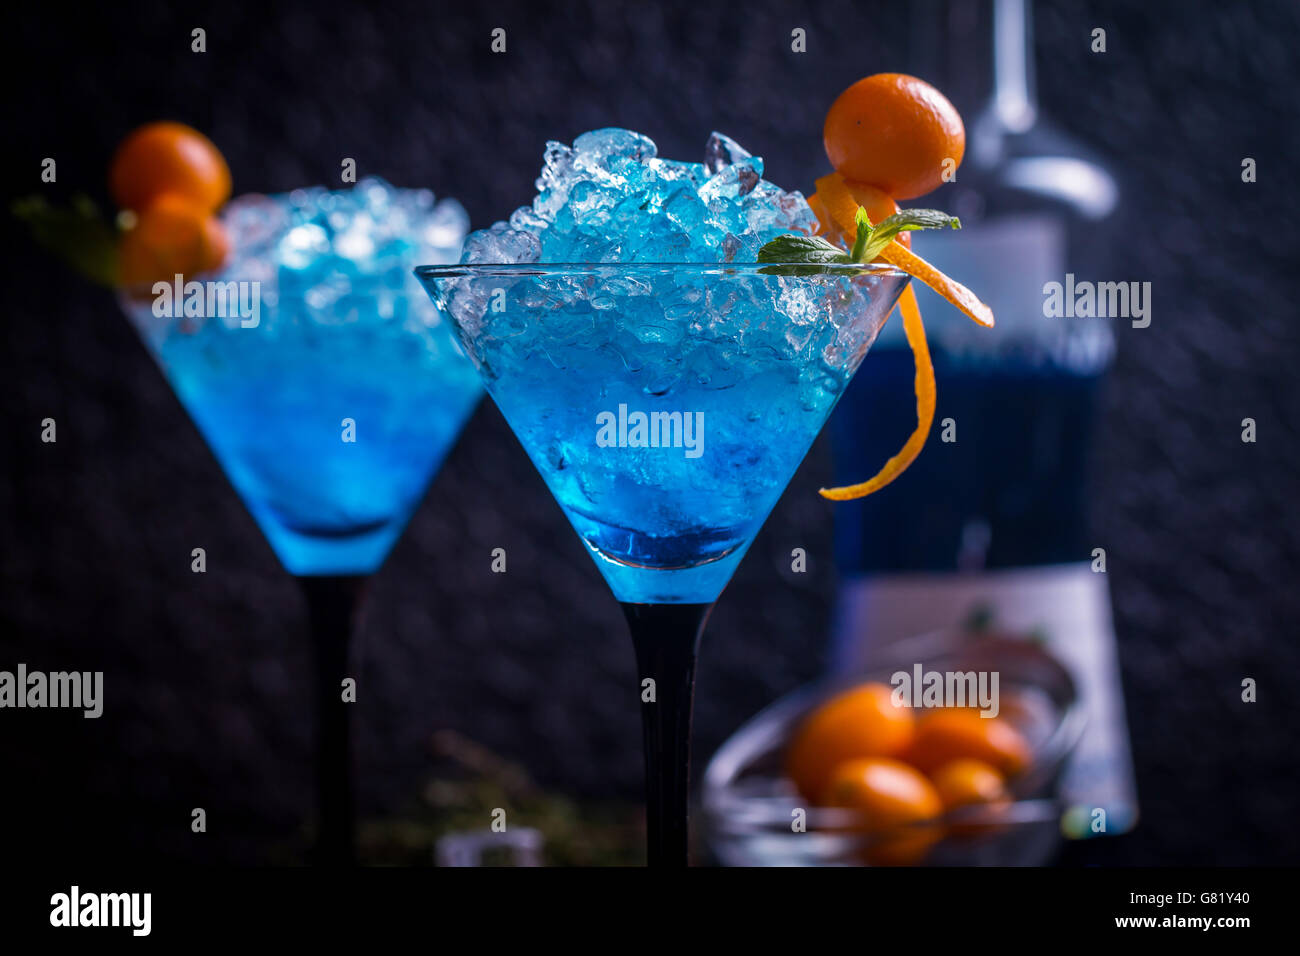 Blue cocktail in martini glasses - Stock Image